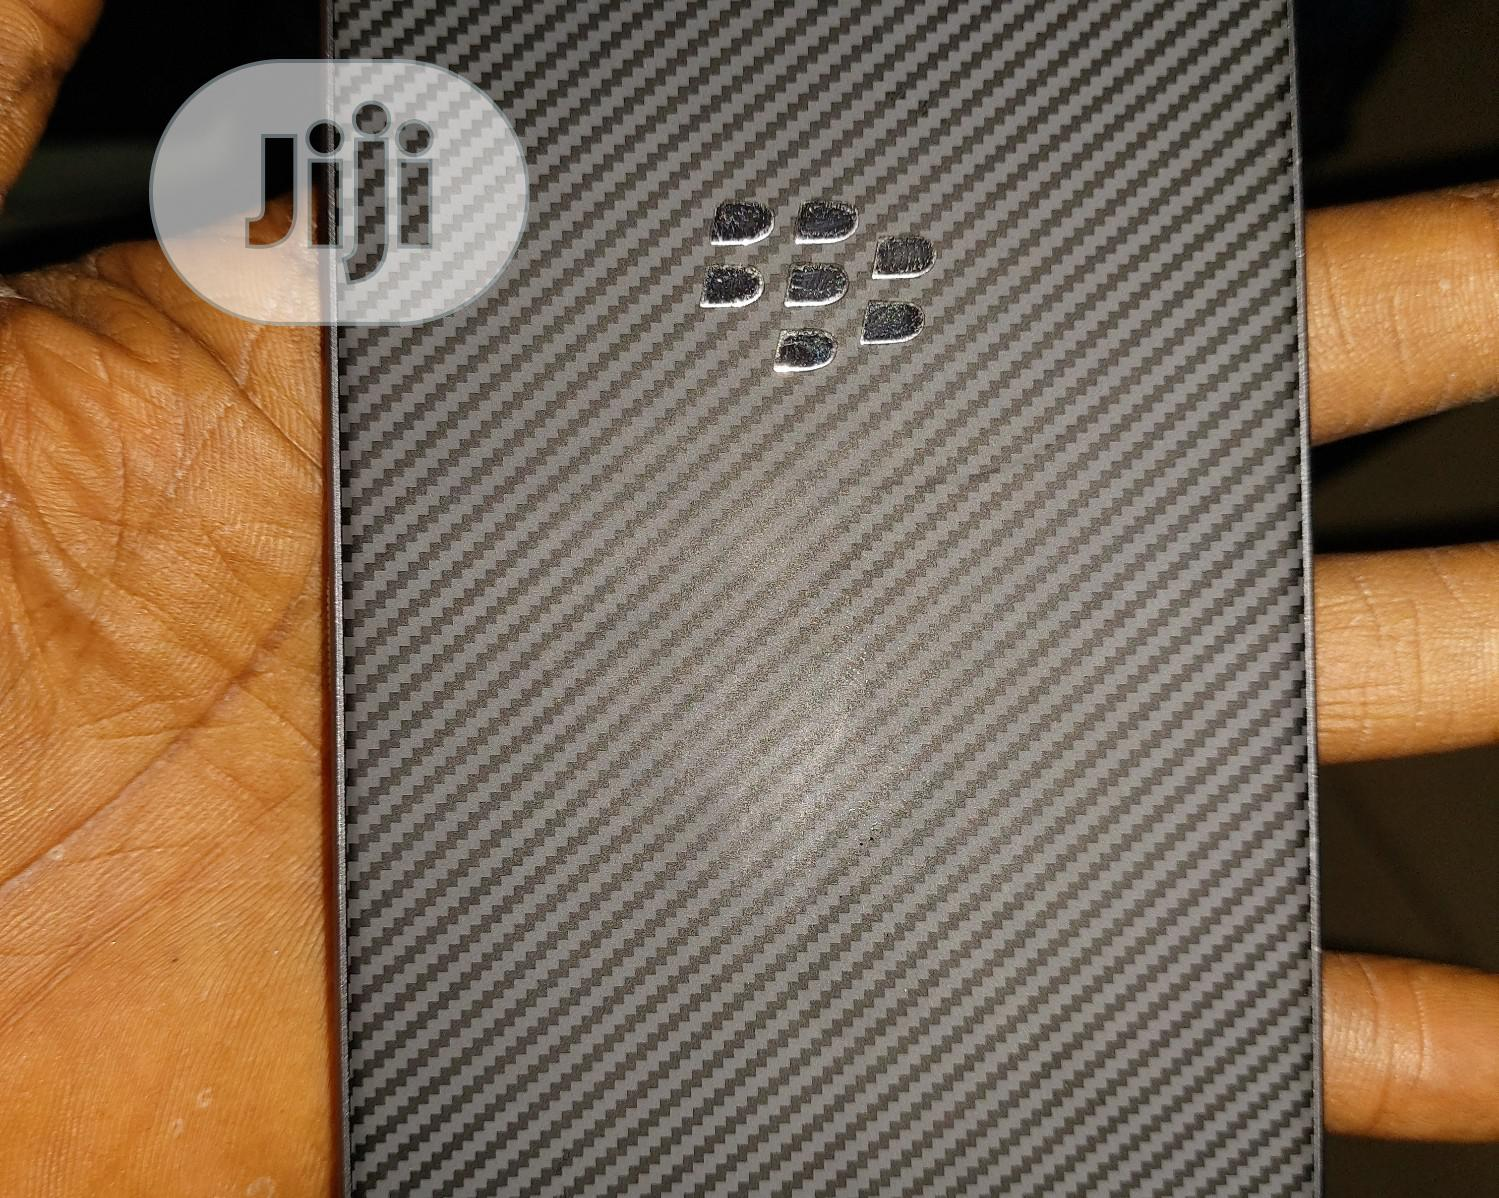 BlackBerry Motion 32 GB | Mobile Phones for sale in Ikeja, Lagos State, Nigeria